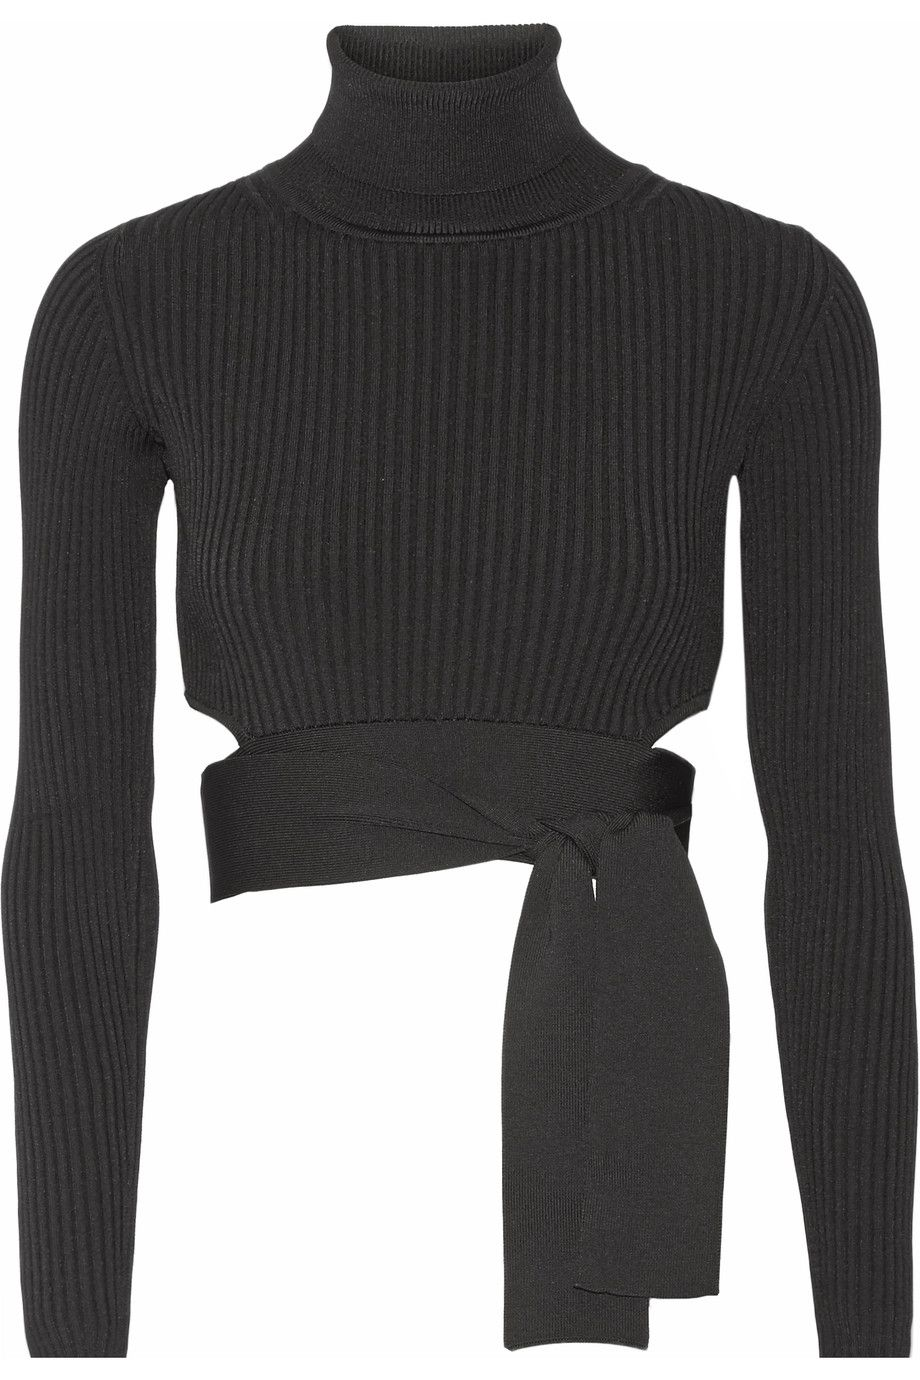 Cushnie et Ochs Cropped ribbed stretch-knit top